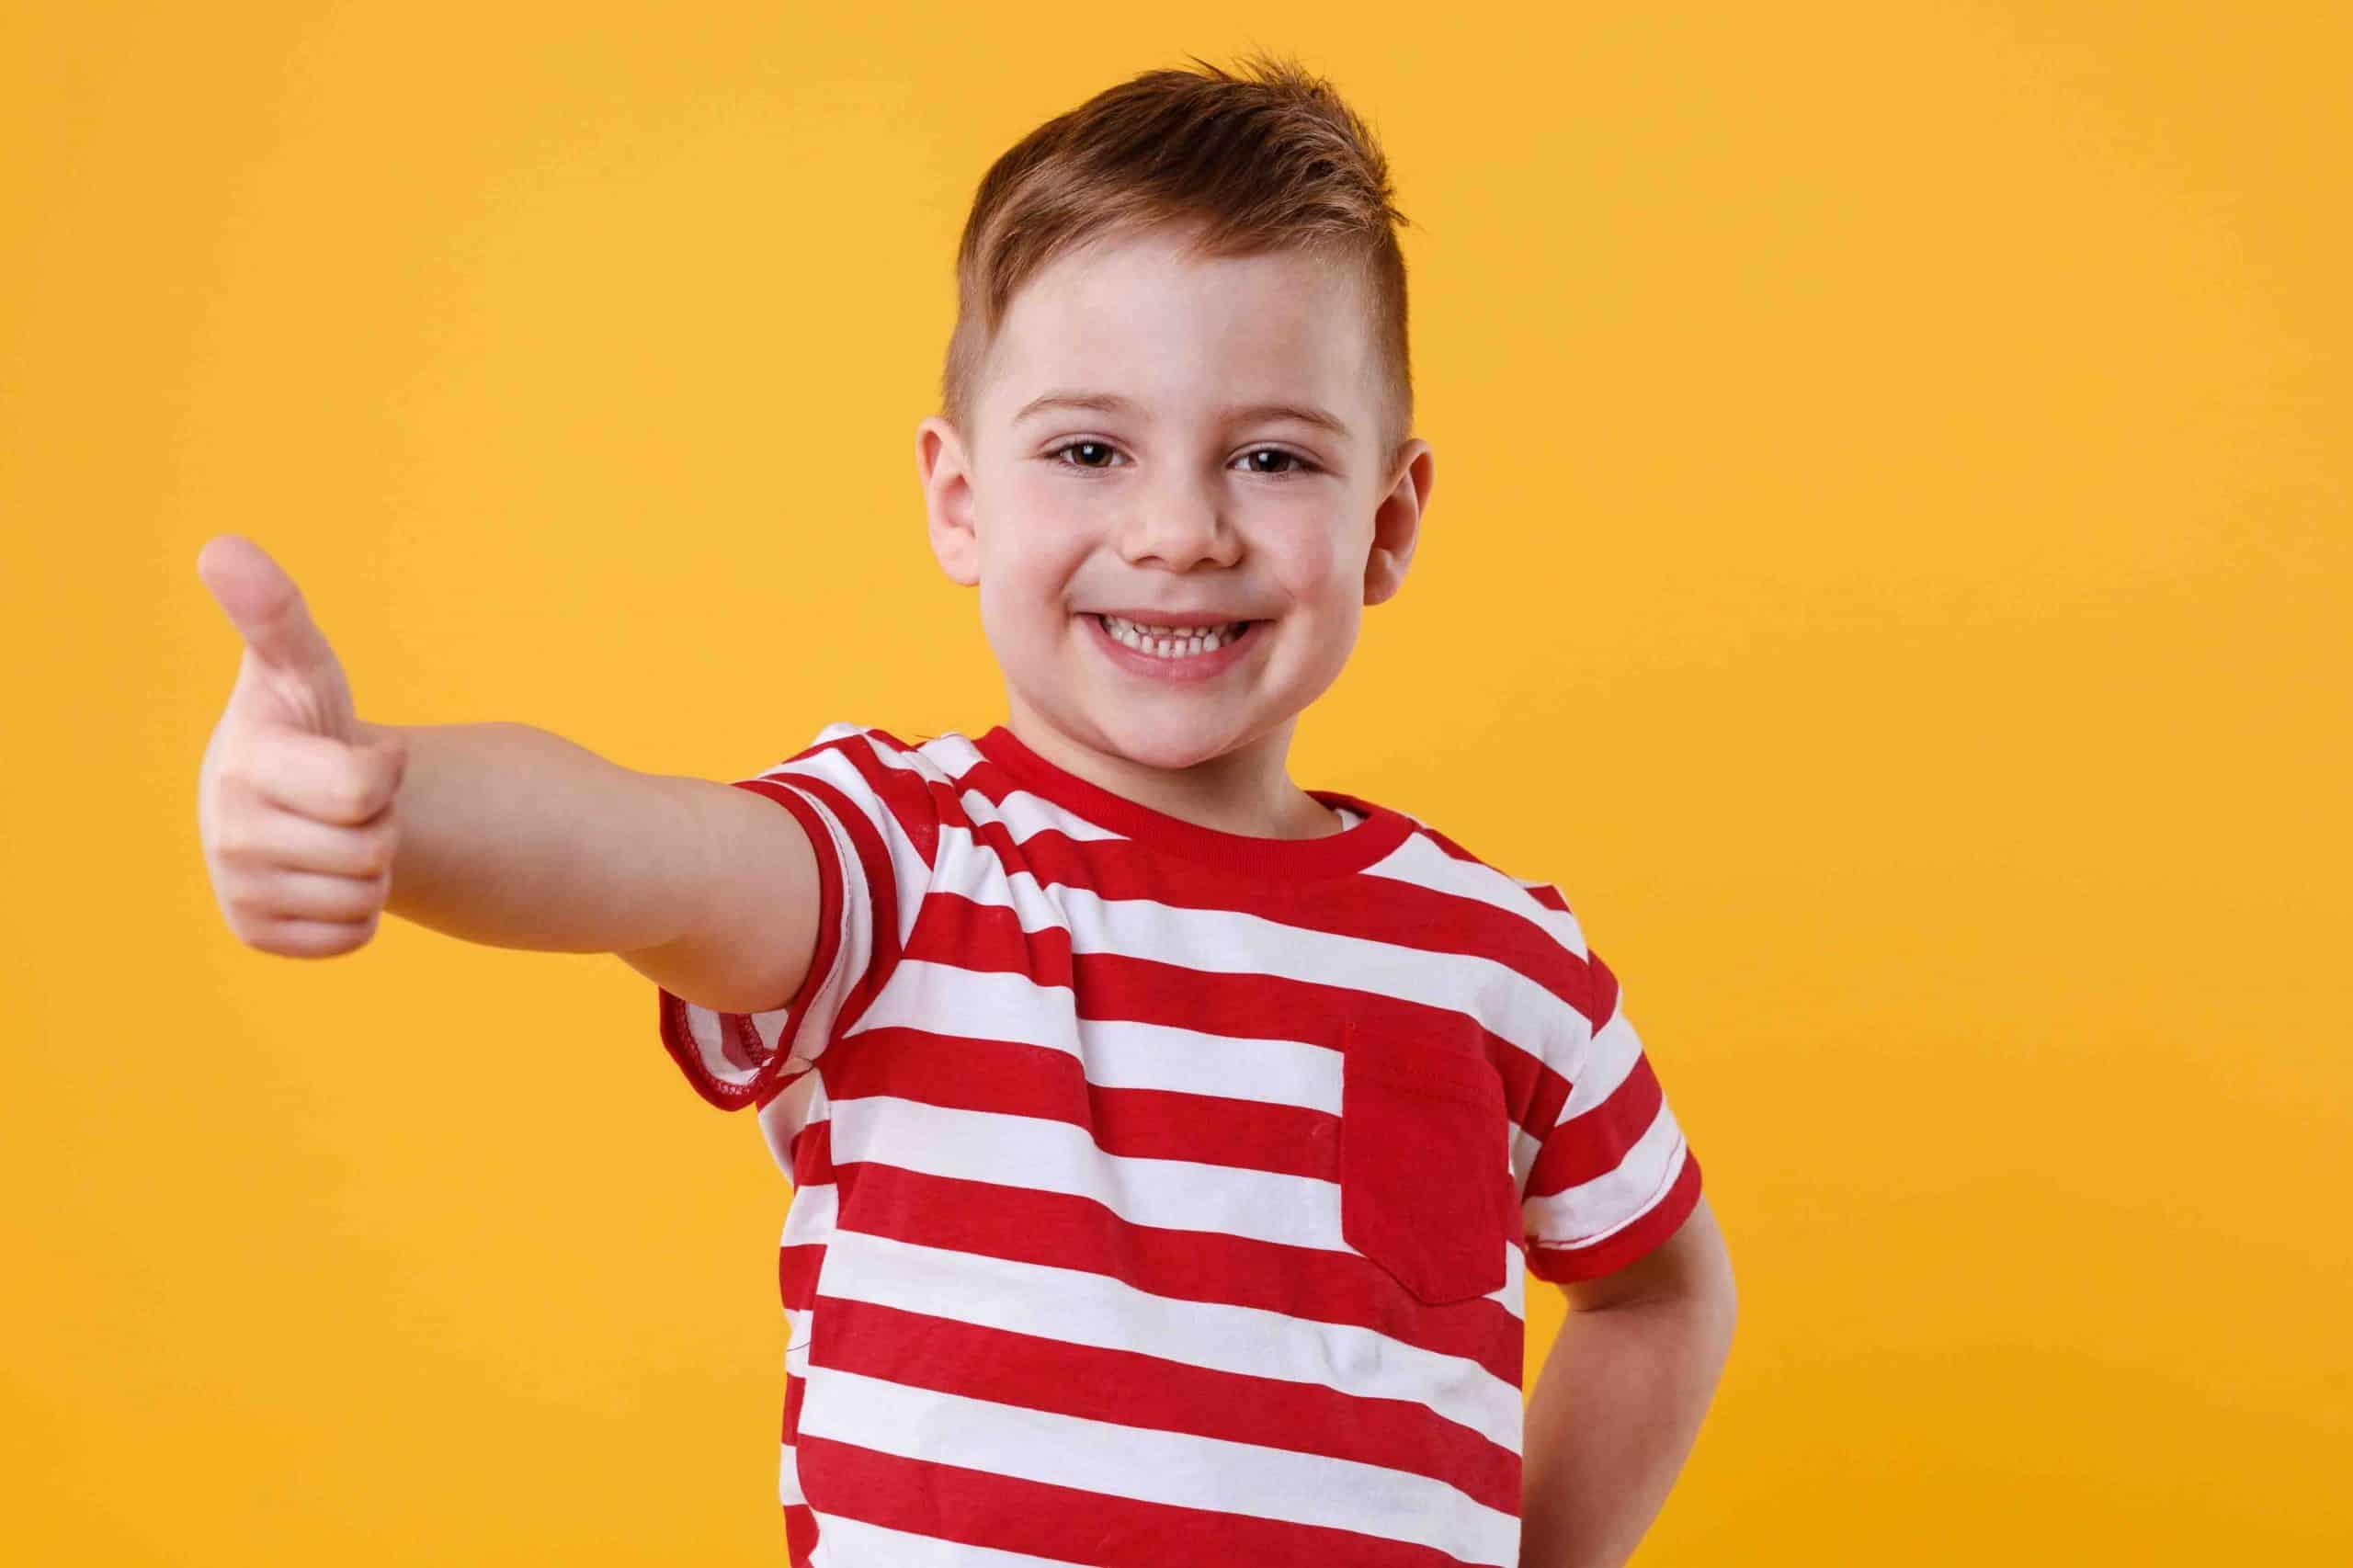 Parenting Hack - Tips To Raise Confident Kids